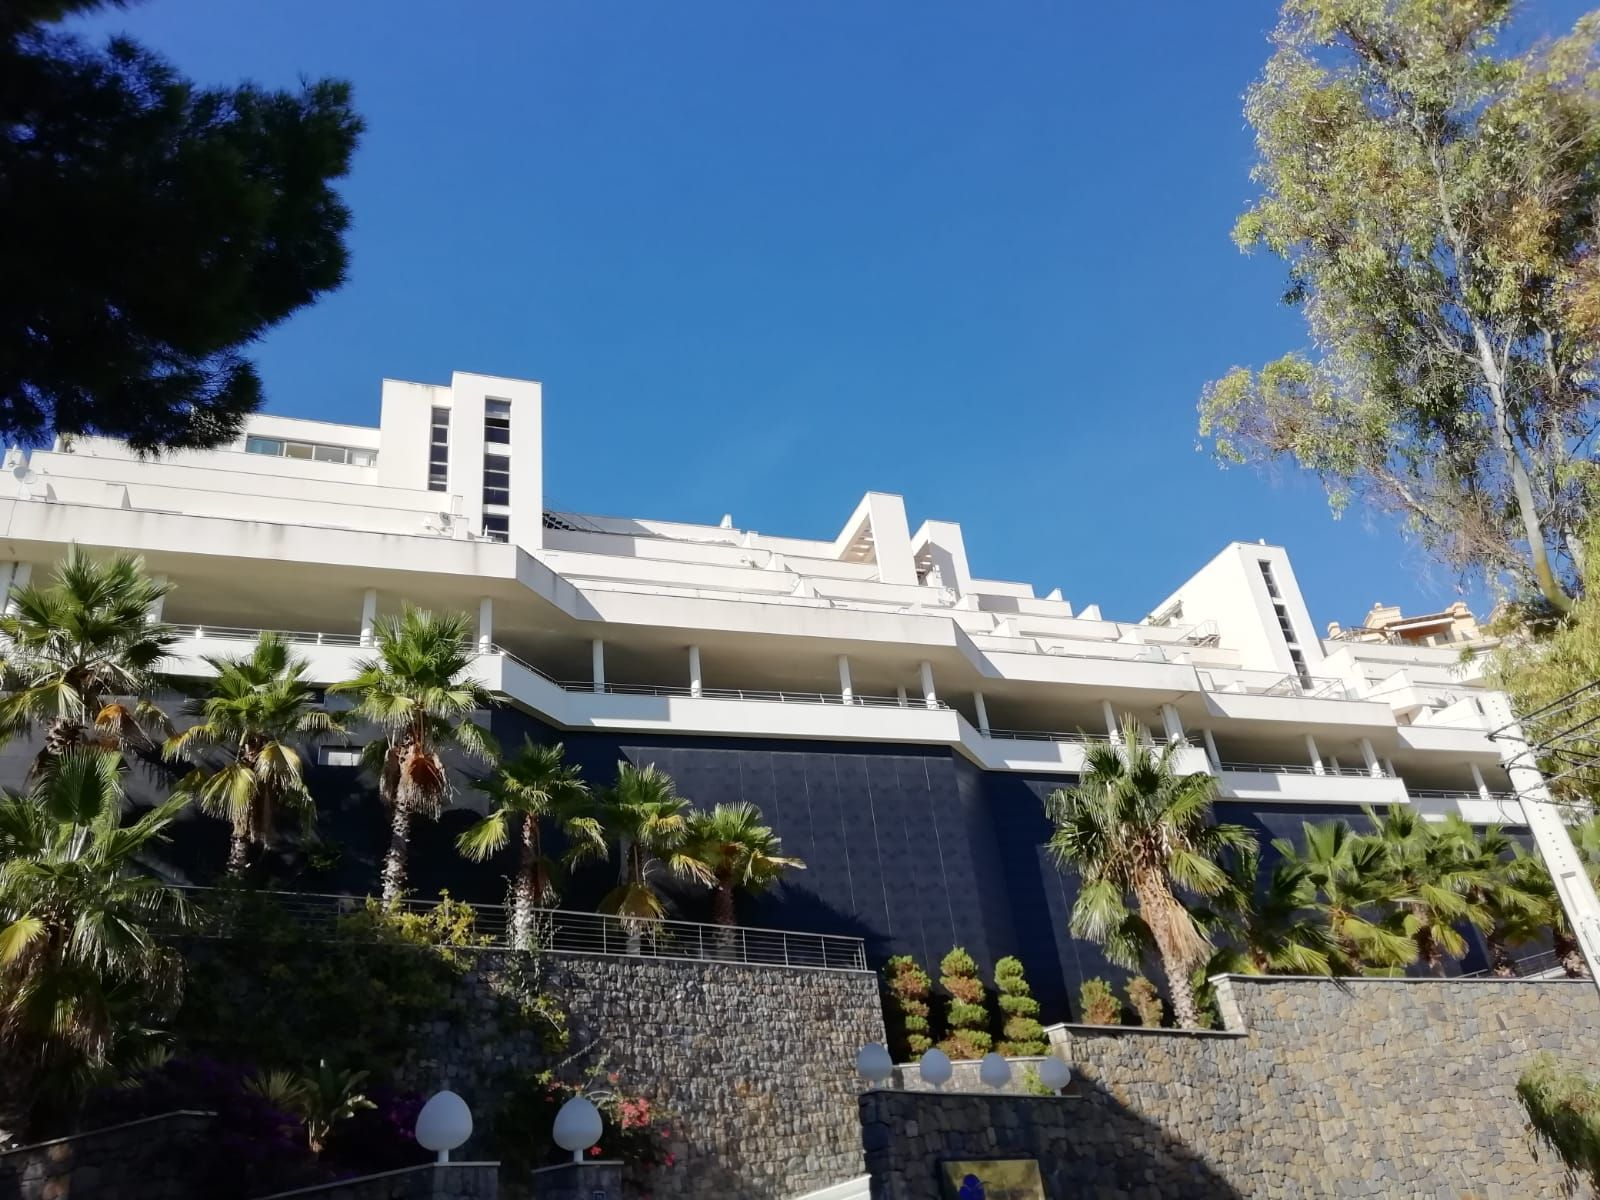 Luxusapartment in Sierra de Altea zu verkaufen